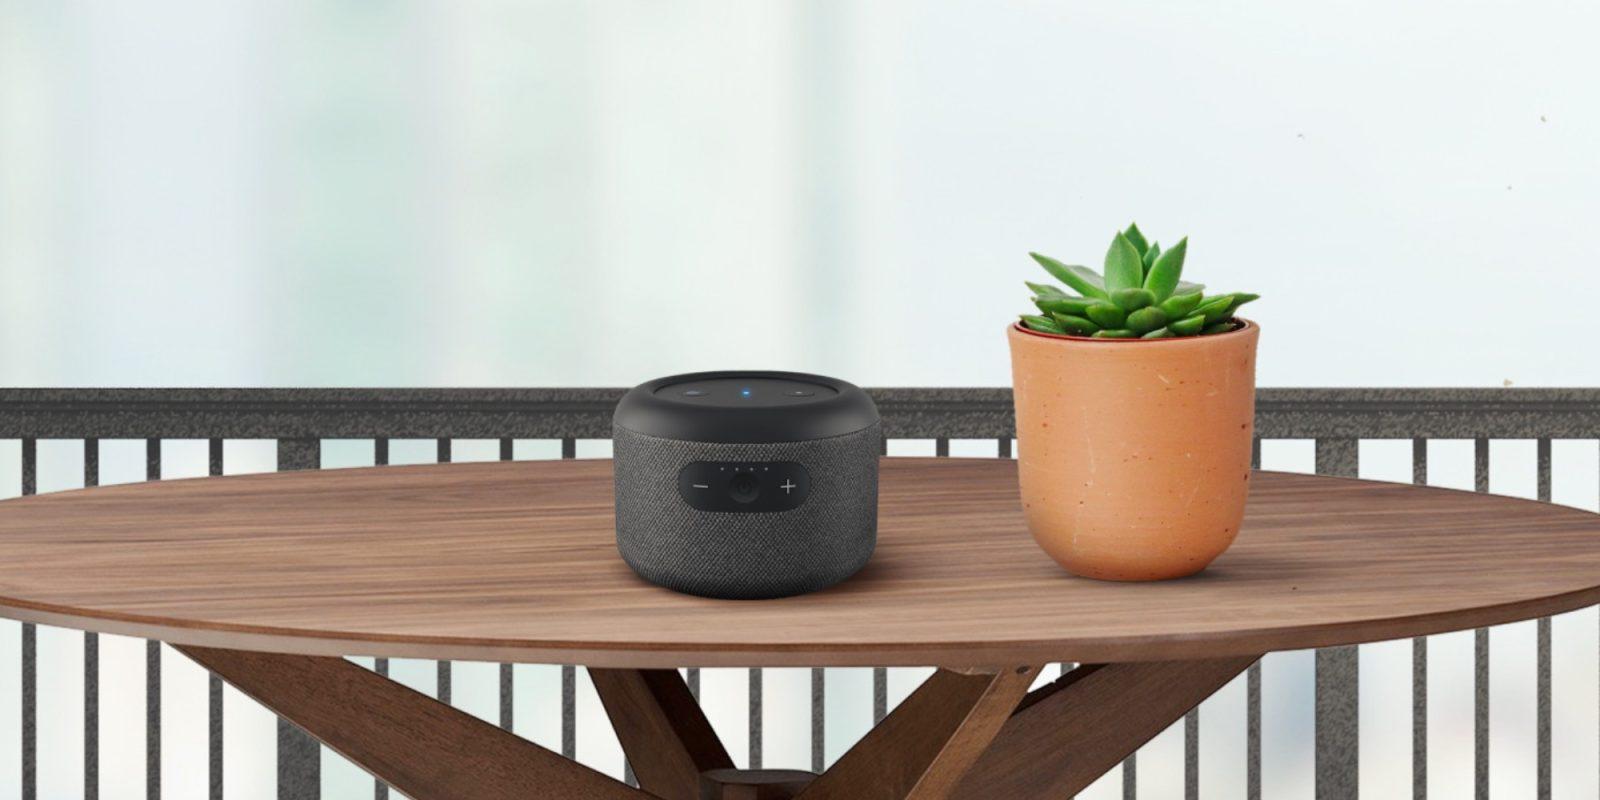 Amazon's latest Alexa-enabled speaker is a spiritual successor to Echo Tap